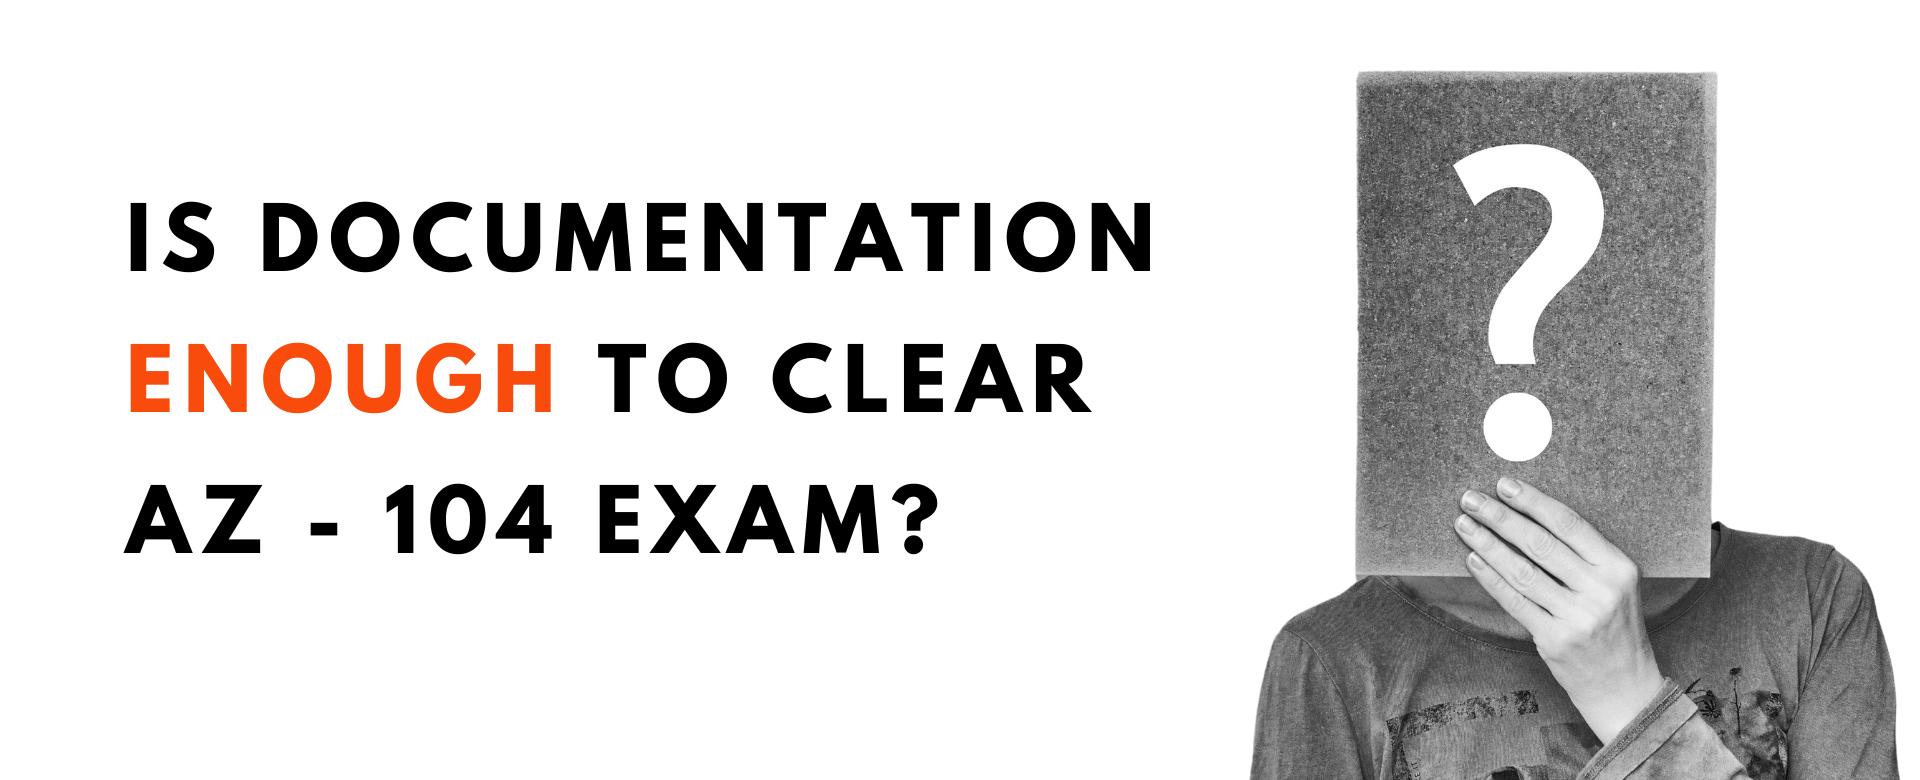 Is Documentation Enough to clear AZ-104 Exam?